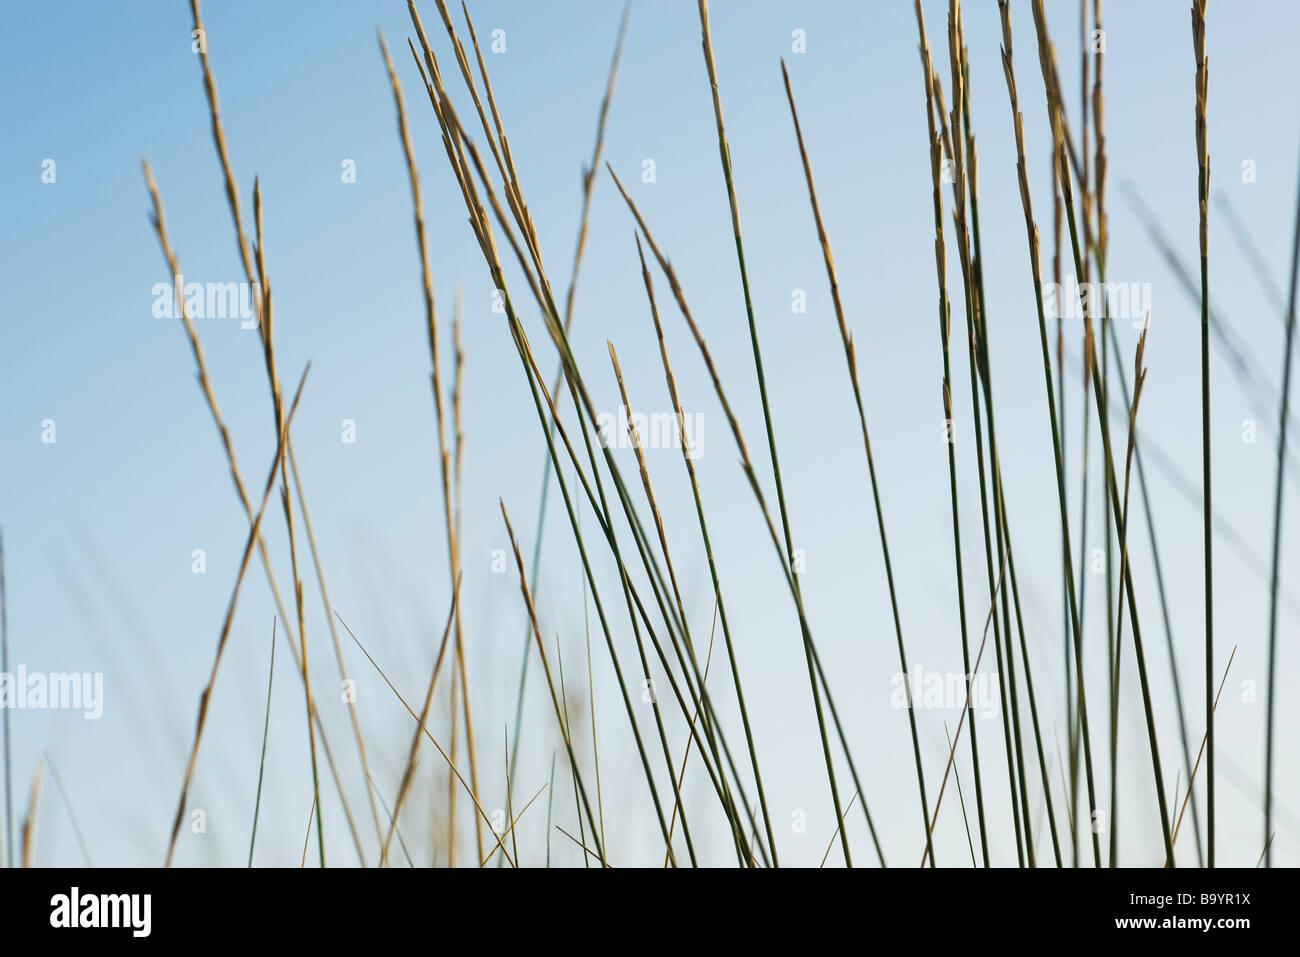 Tall grass, close-up - Stock Image